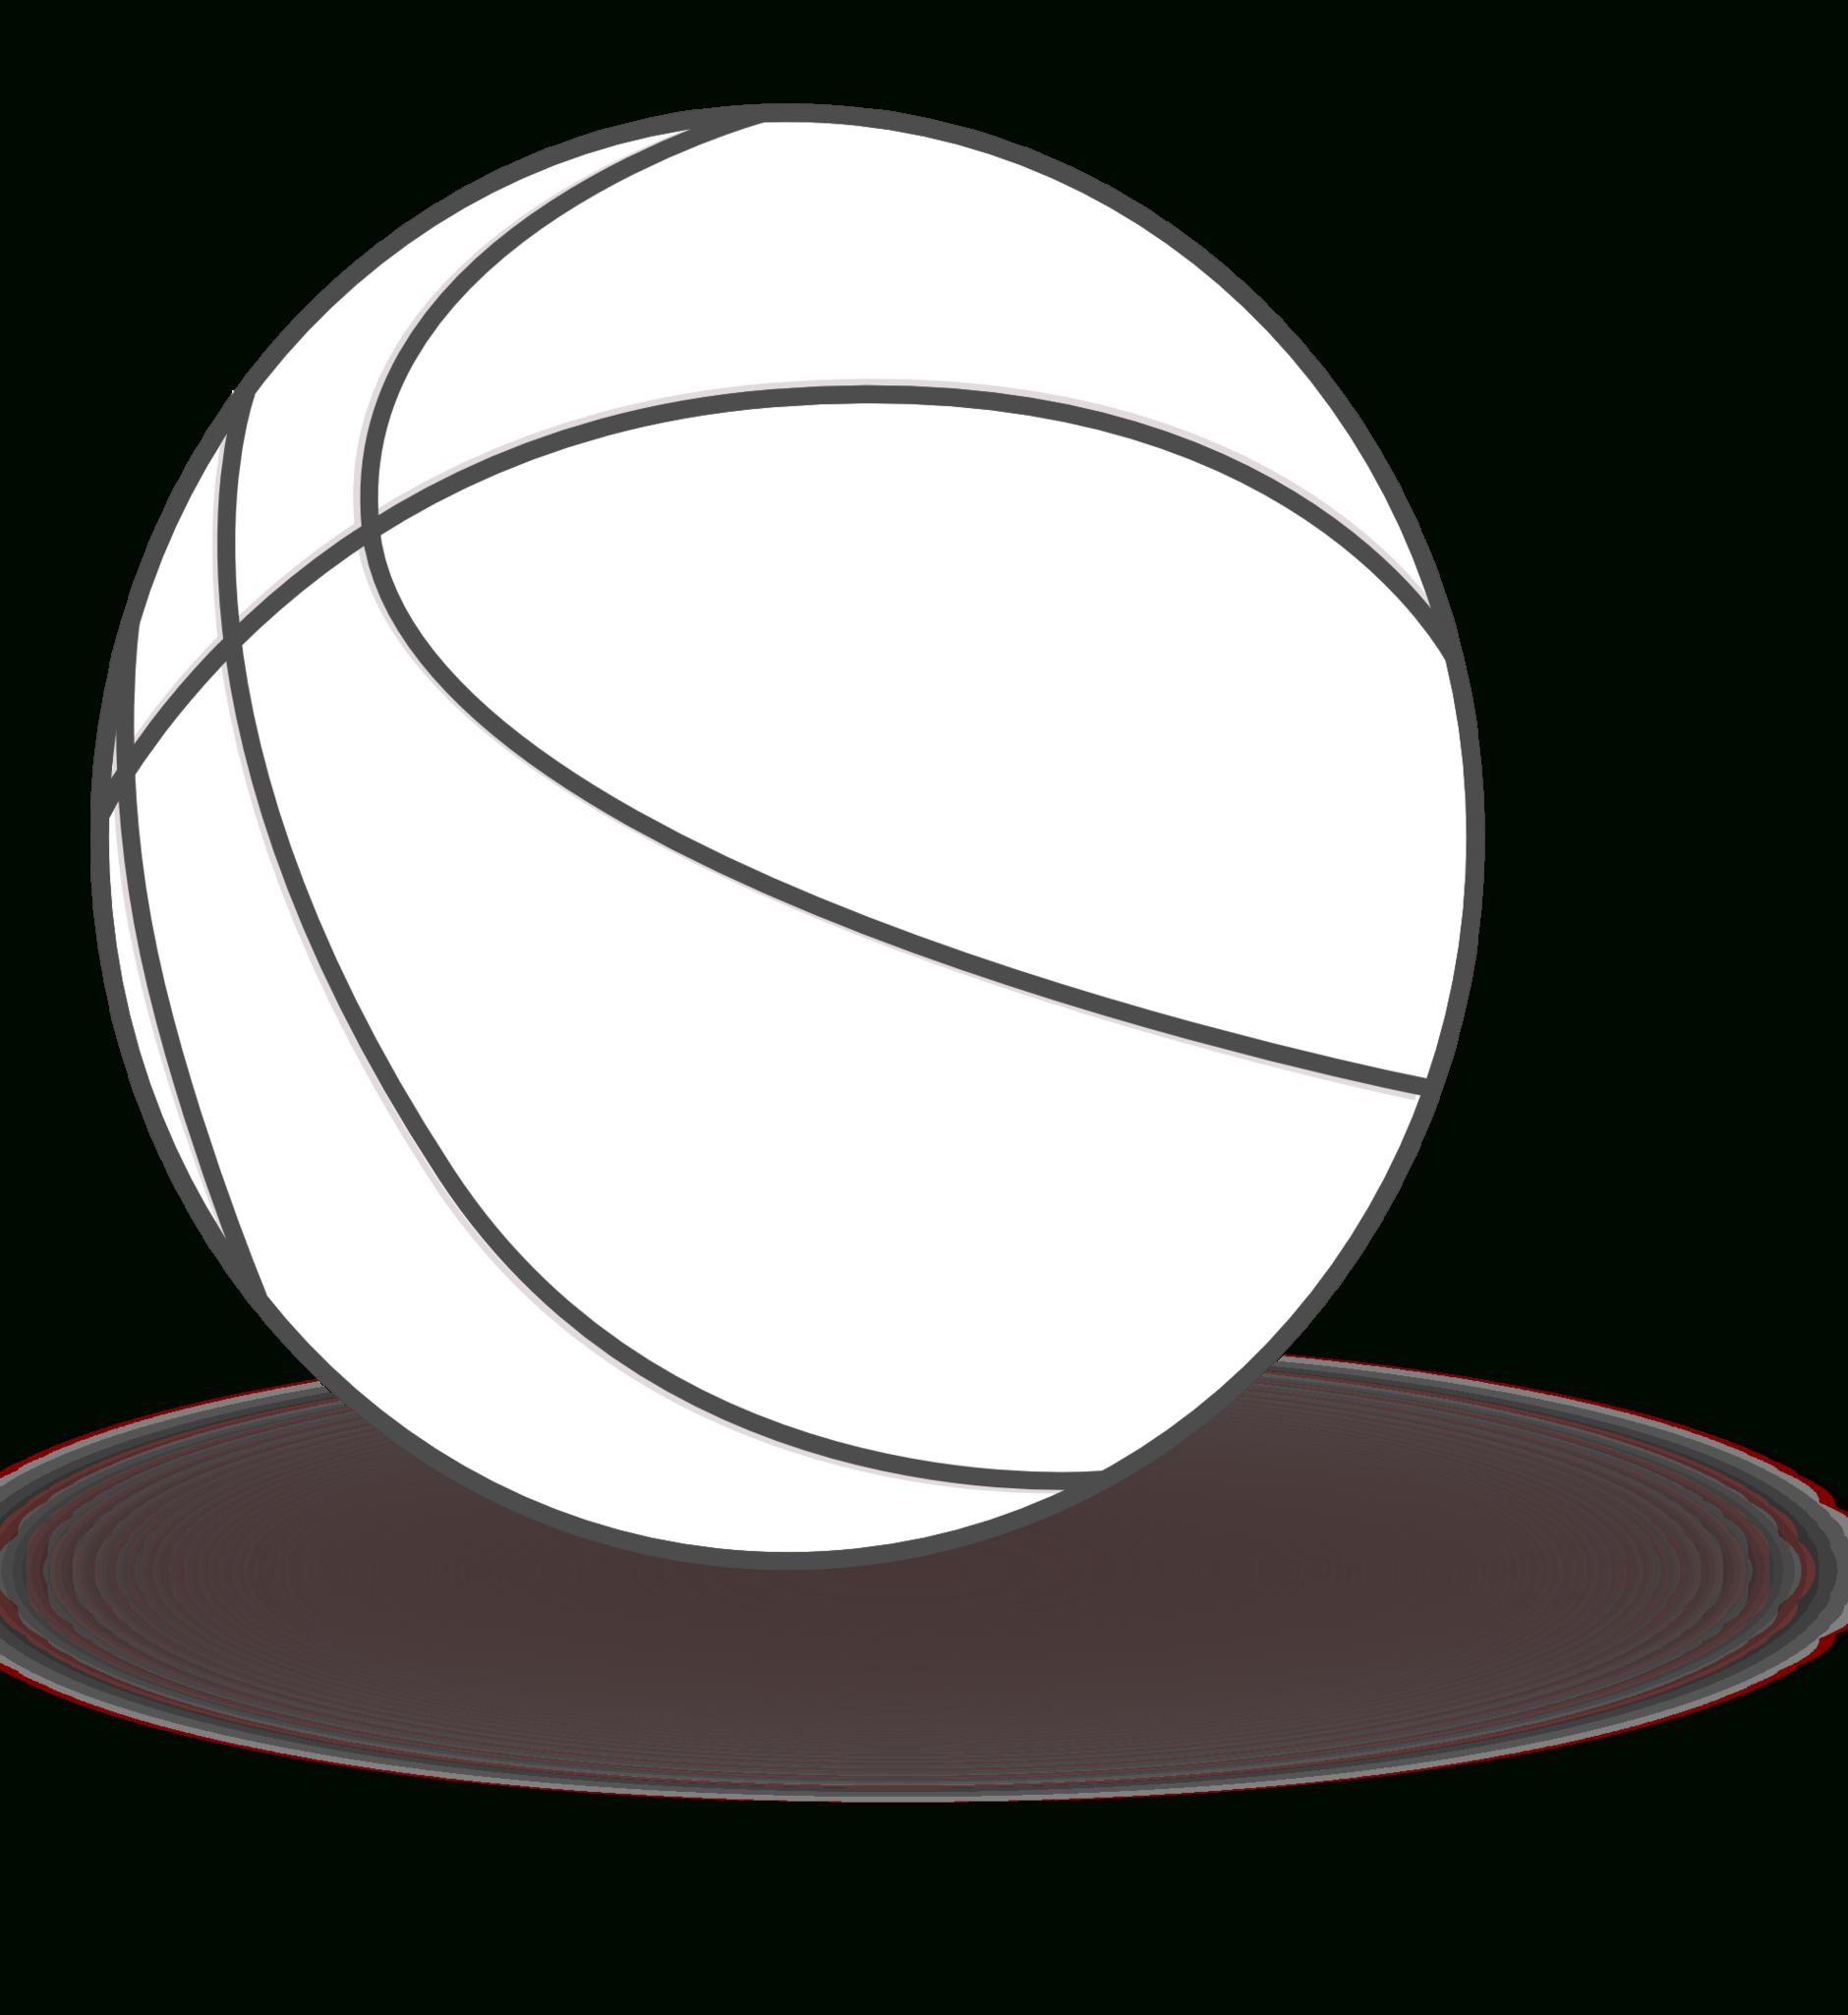 Half basketball clipart banner black and white stock Lovely Of Half Basketball Clipart Black And White | Letters Format banner black and white stock